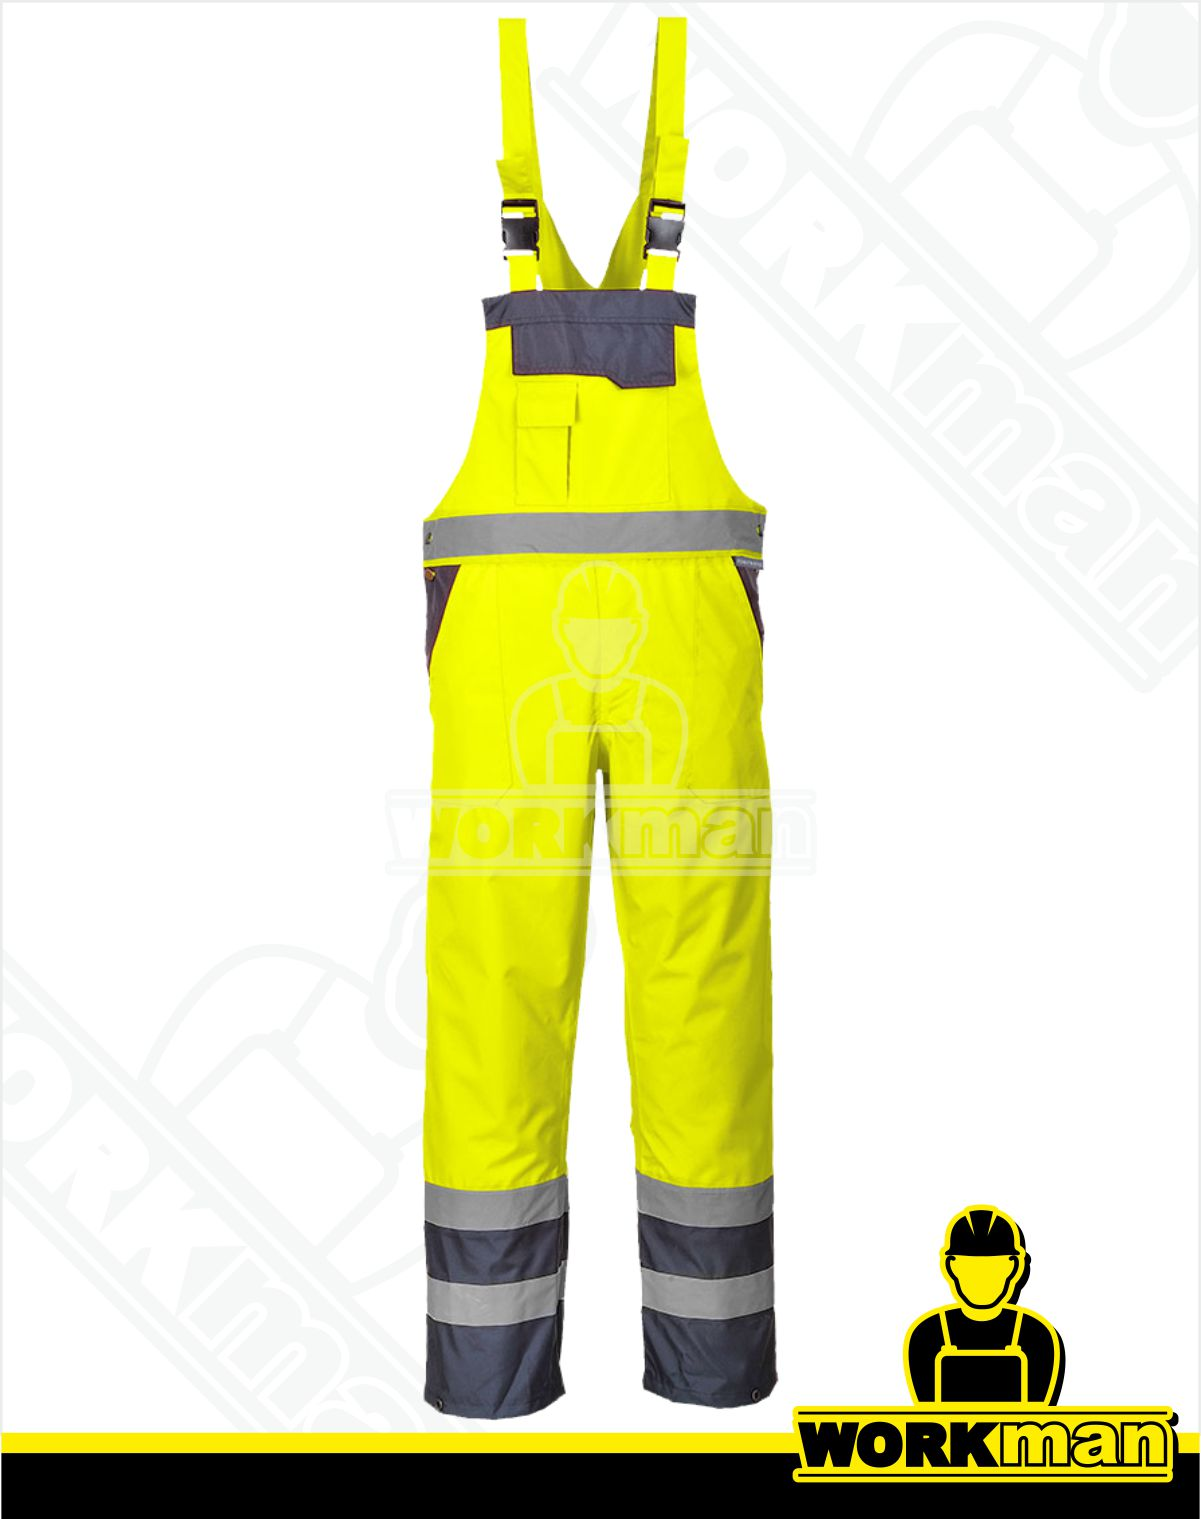 ac840c3f3609 Reflexné nohavice Hi-Vis S488 s náprsenkou Portwest žltá